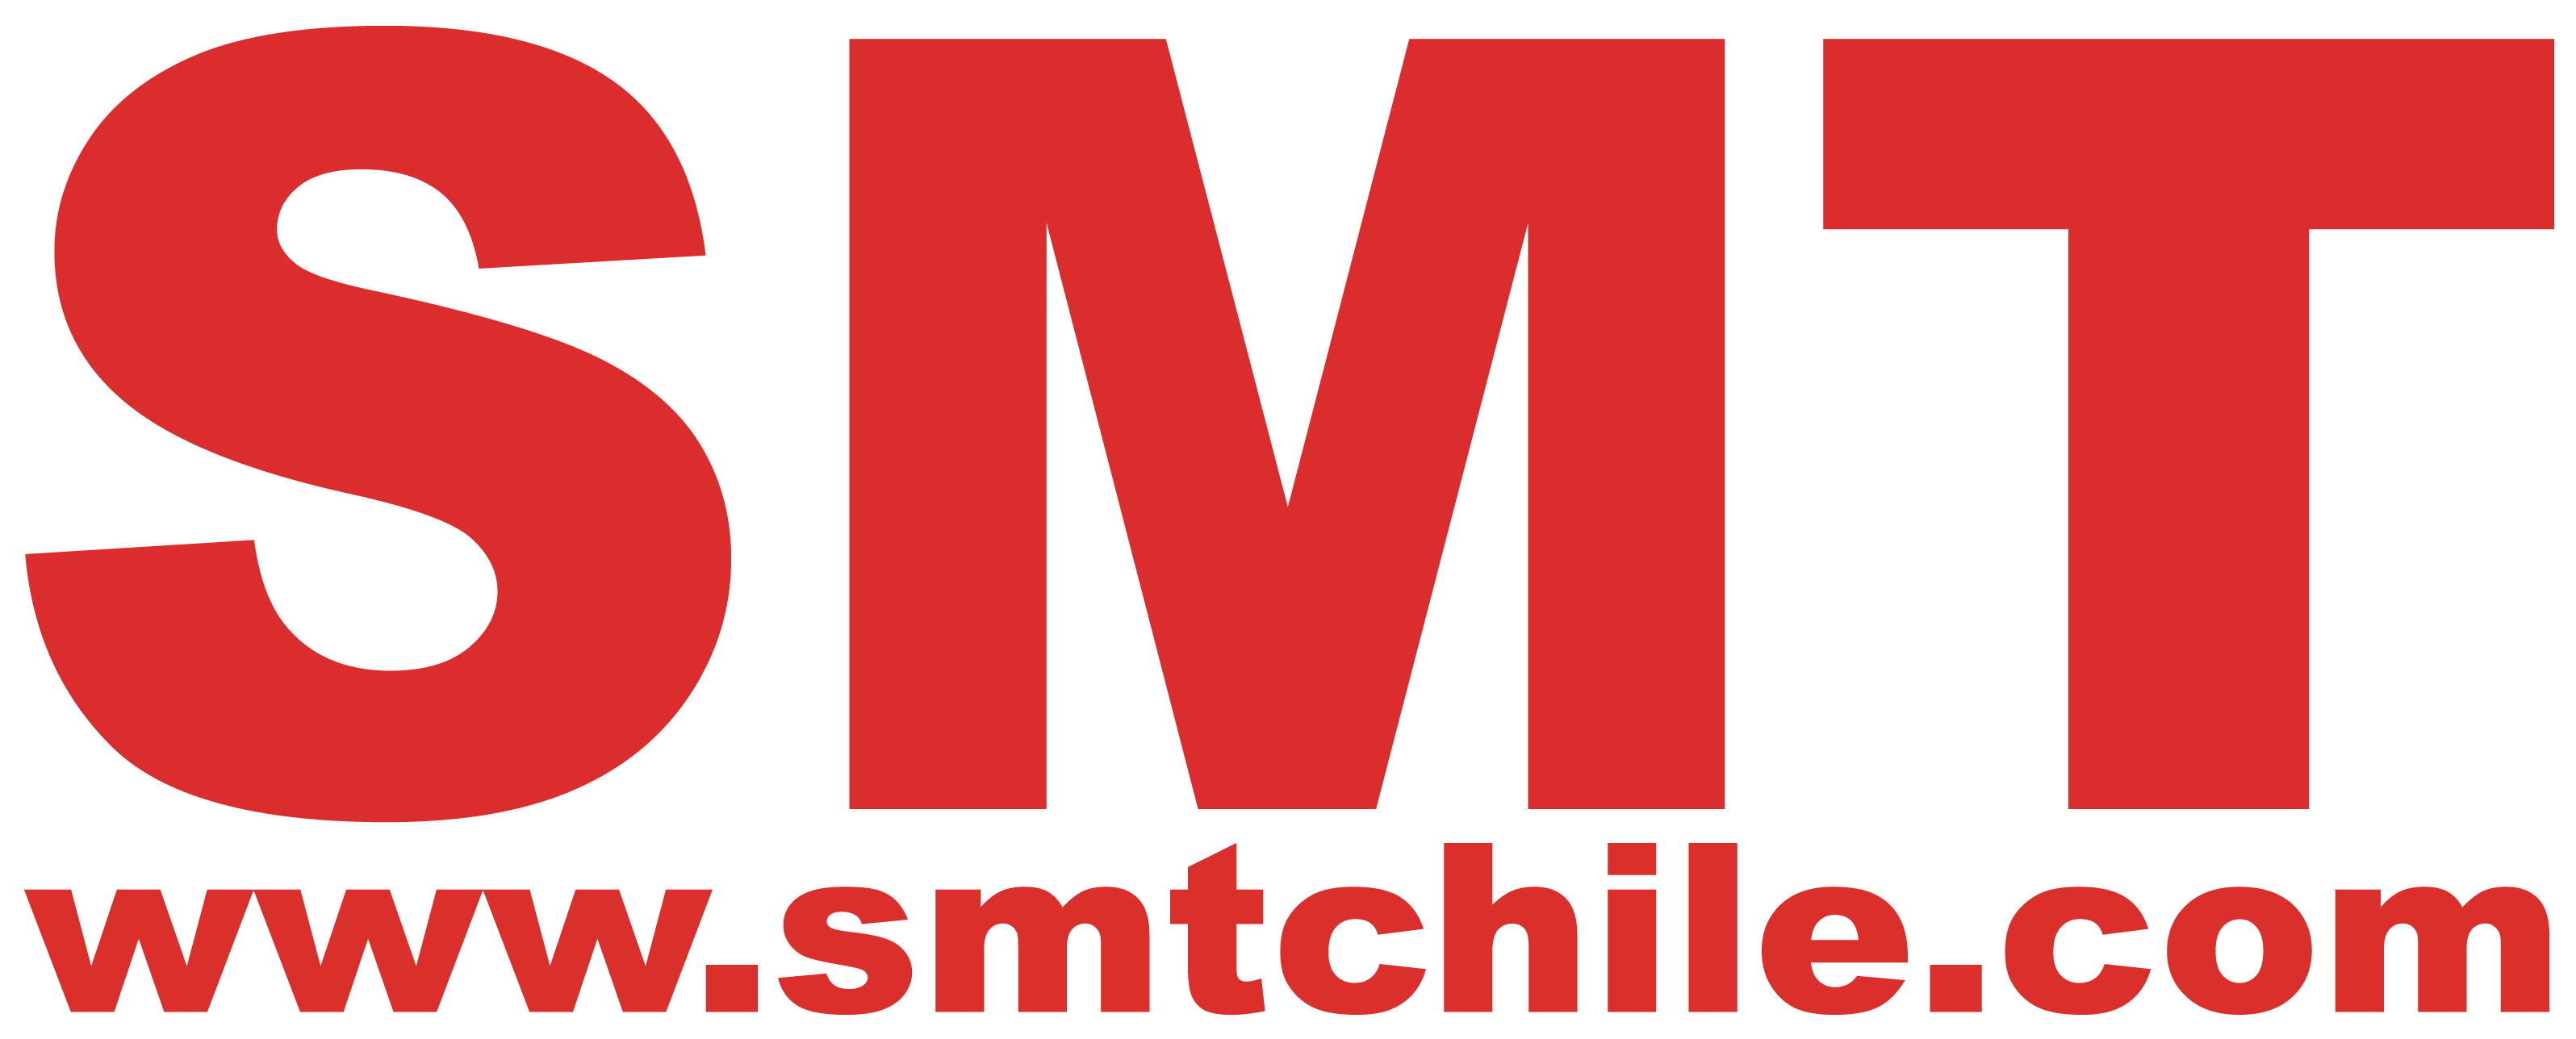 SMT Chile